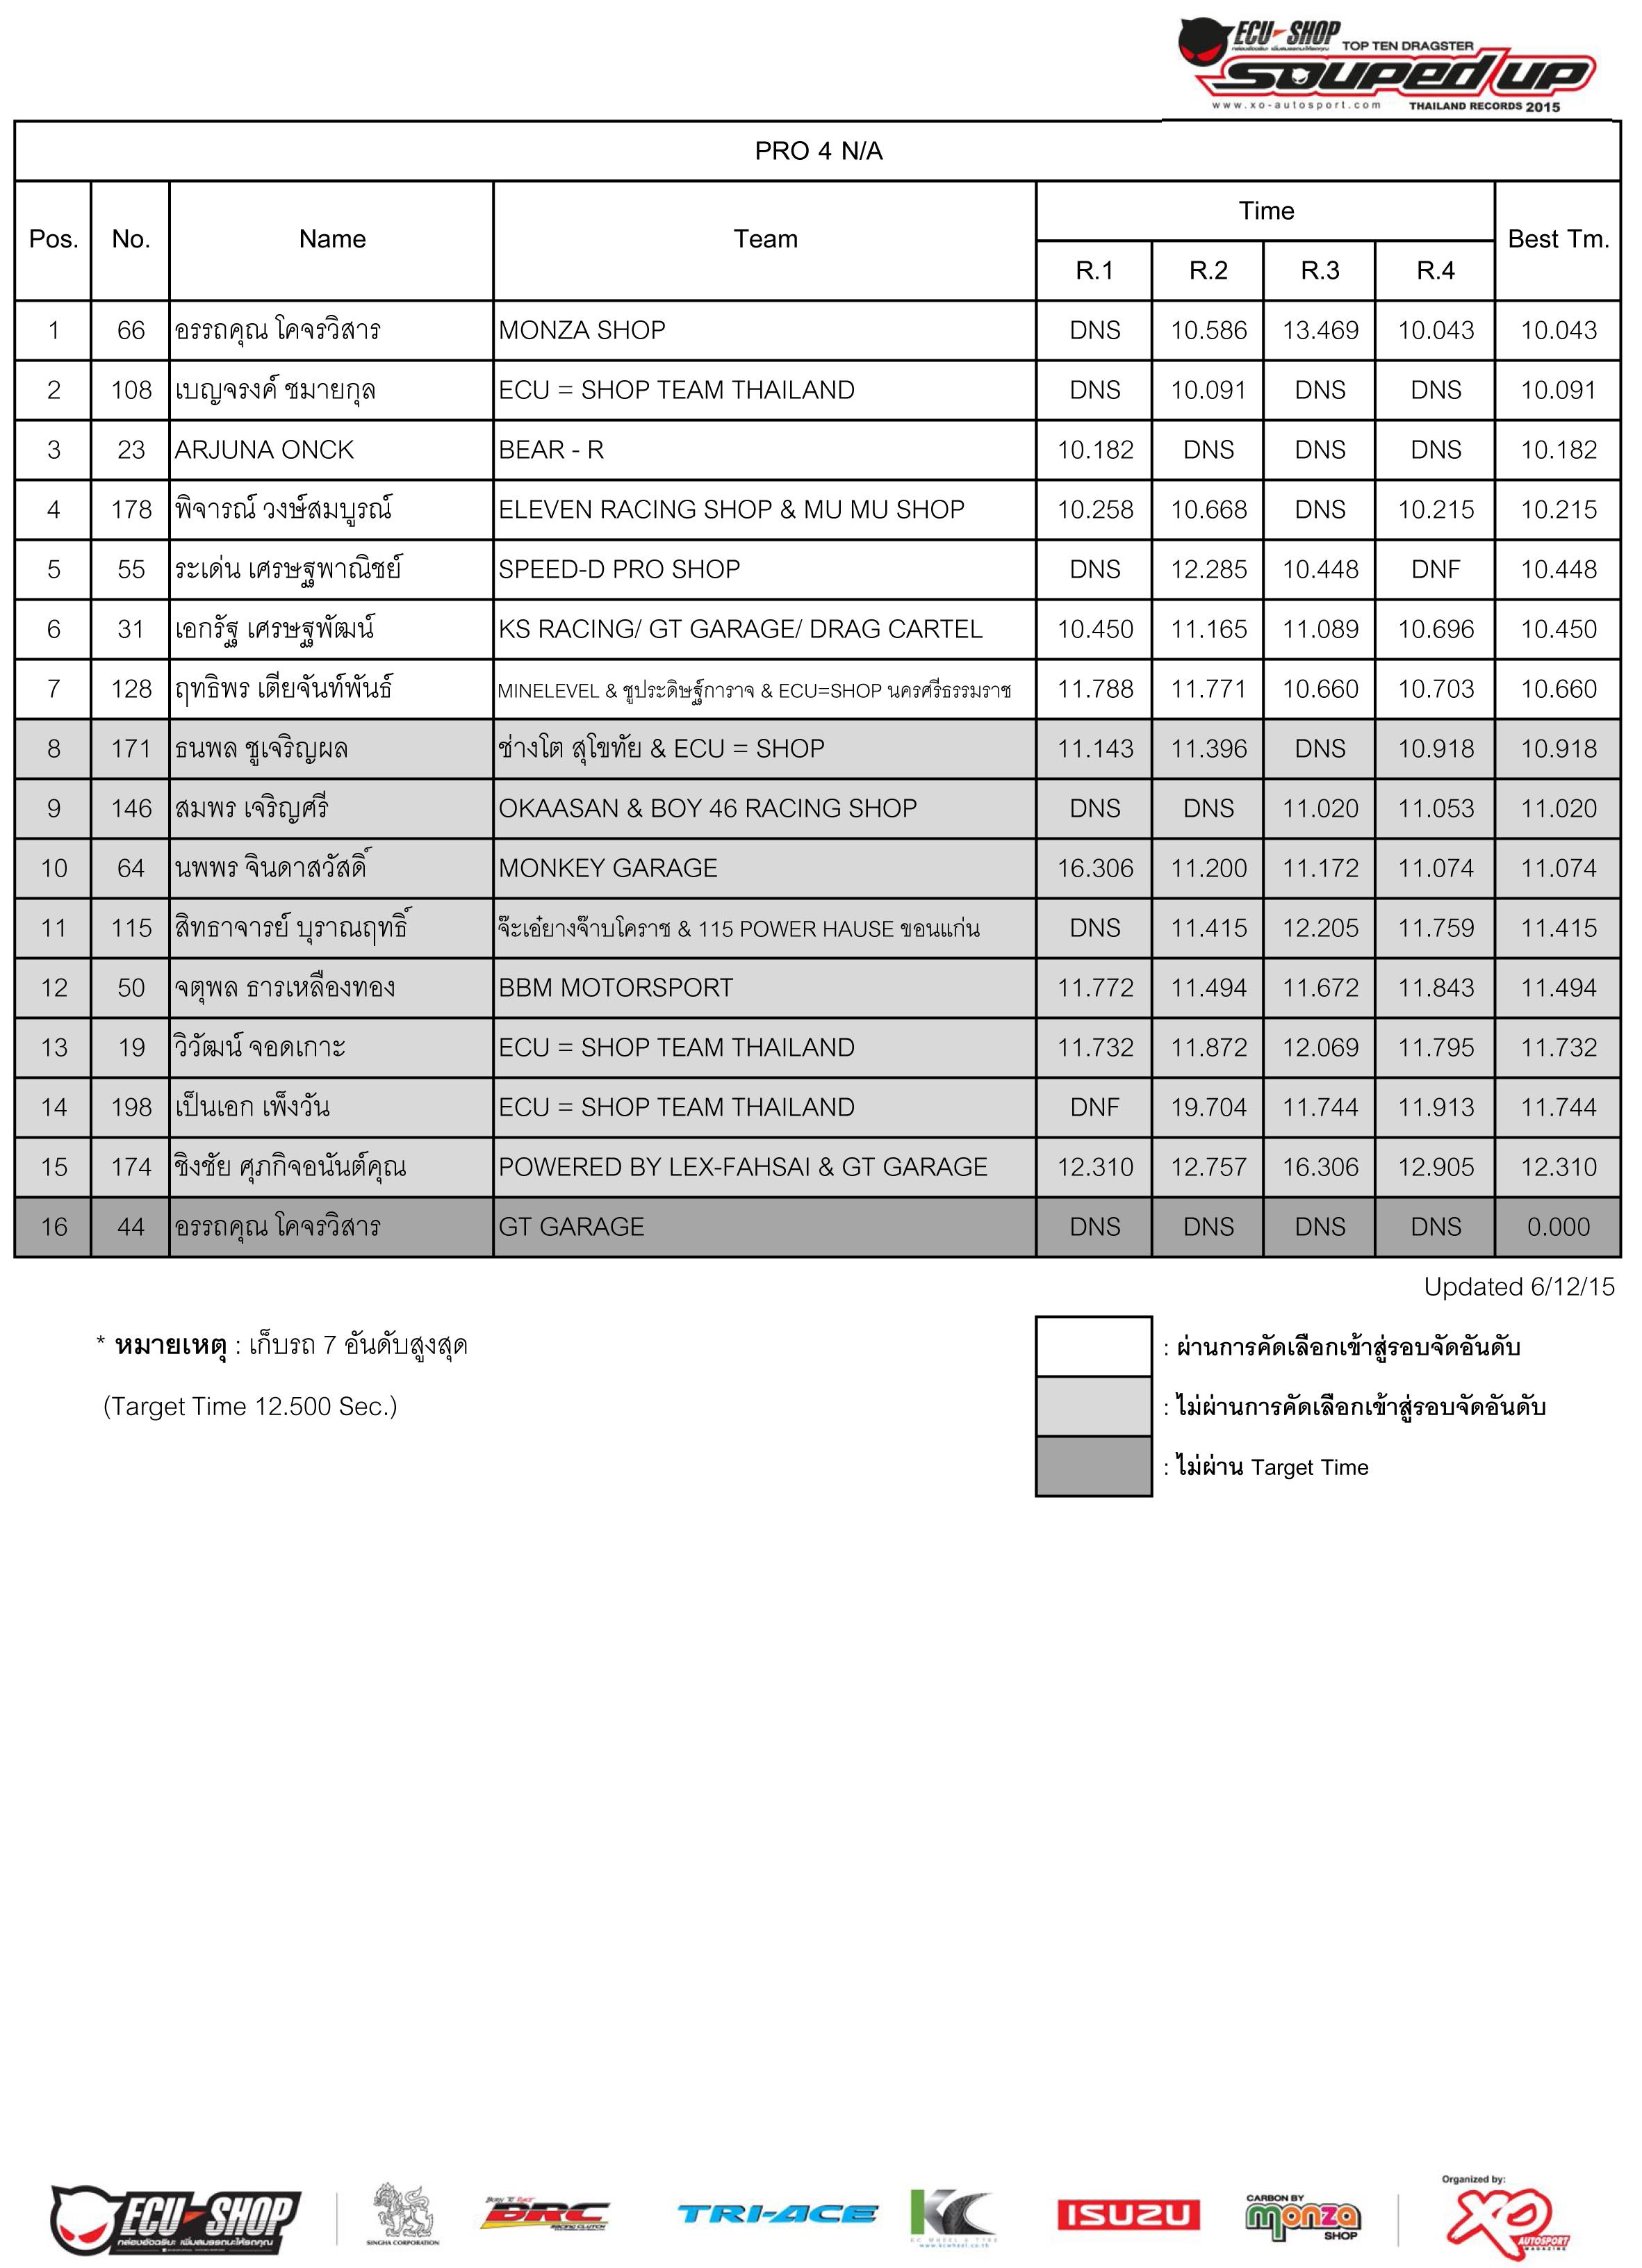 Qualify 2015-12